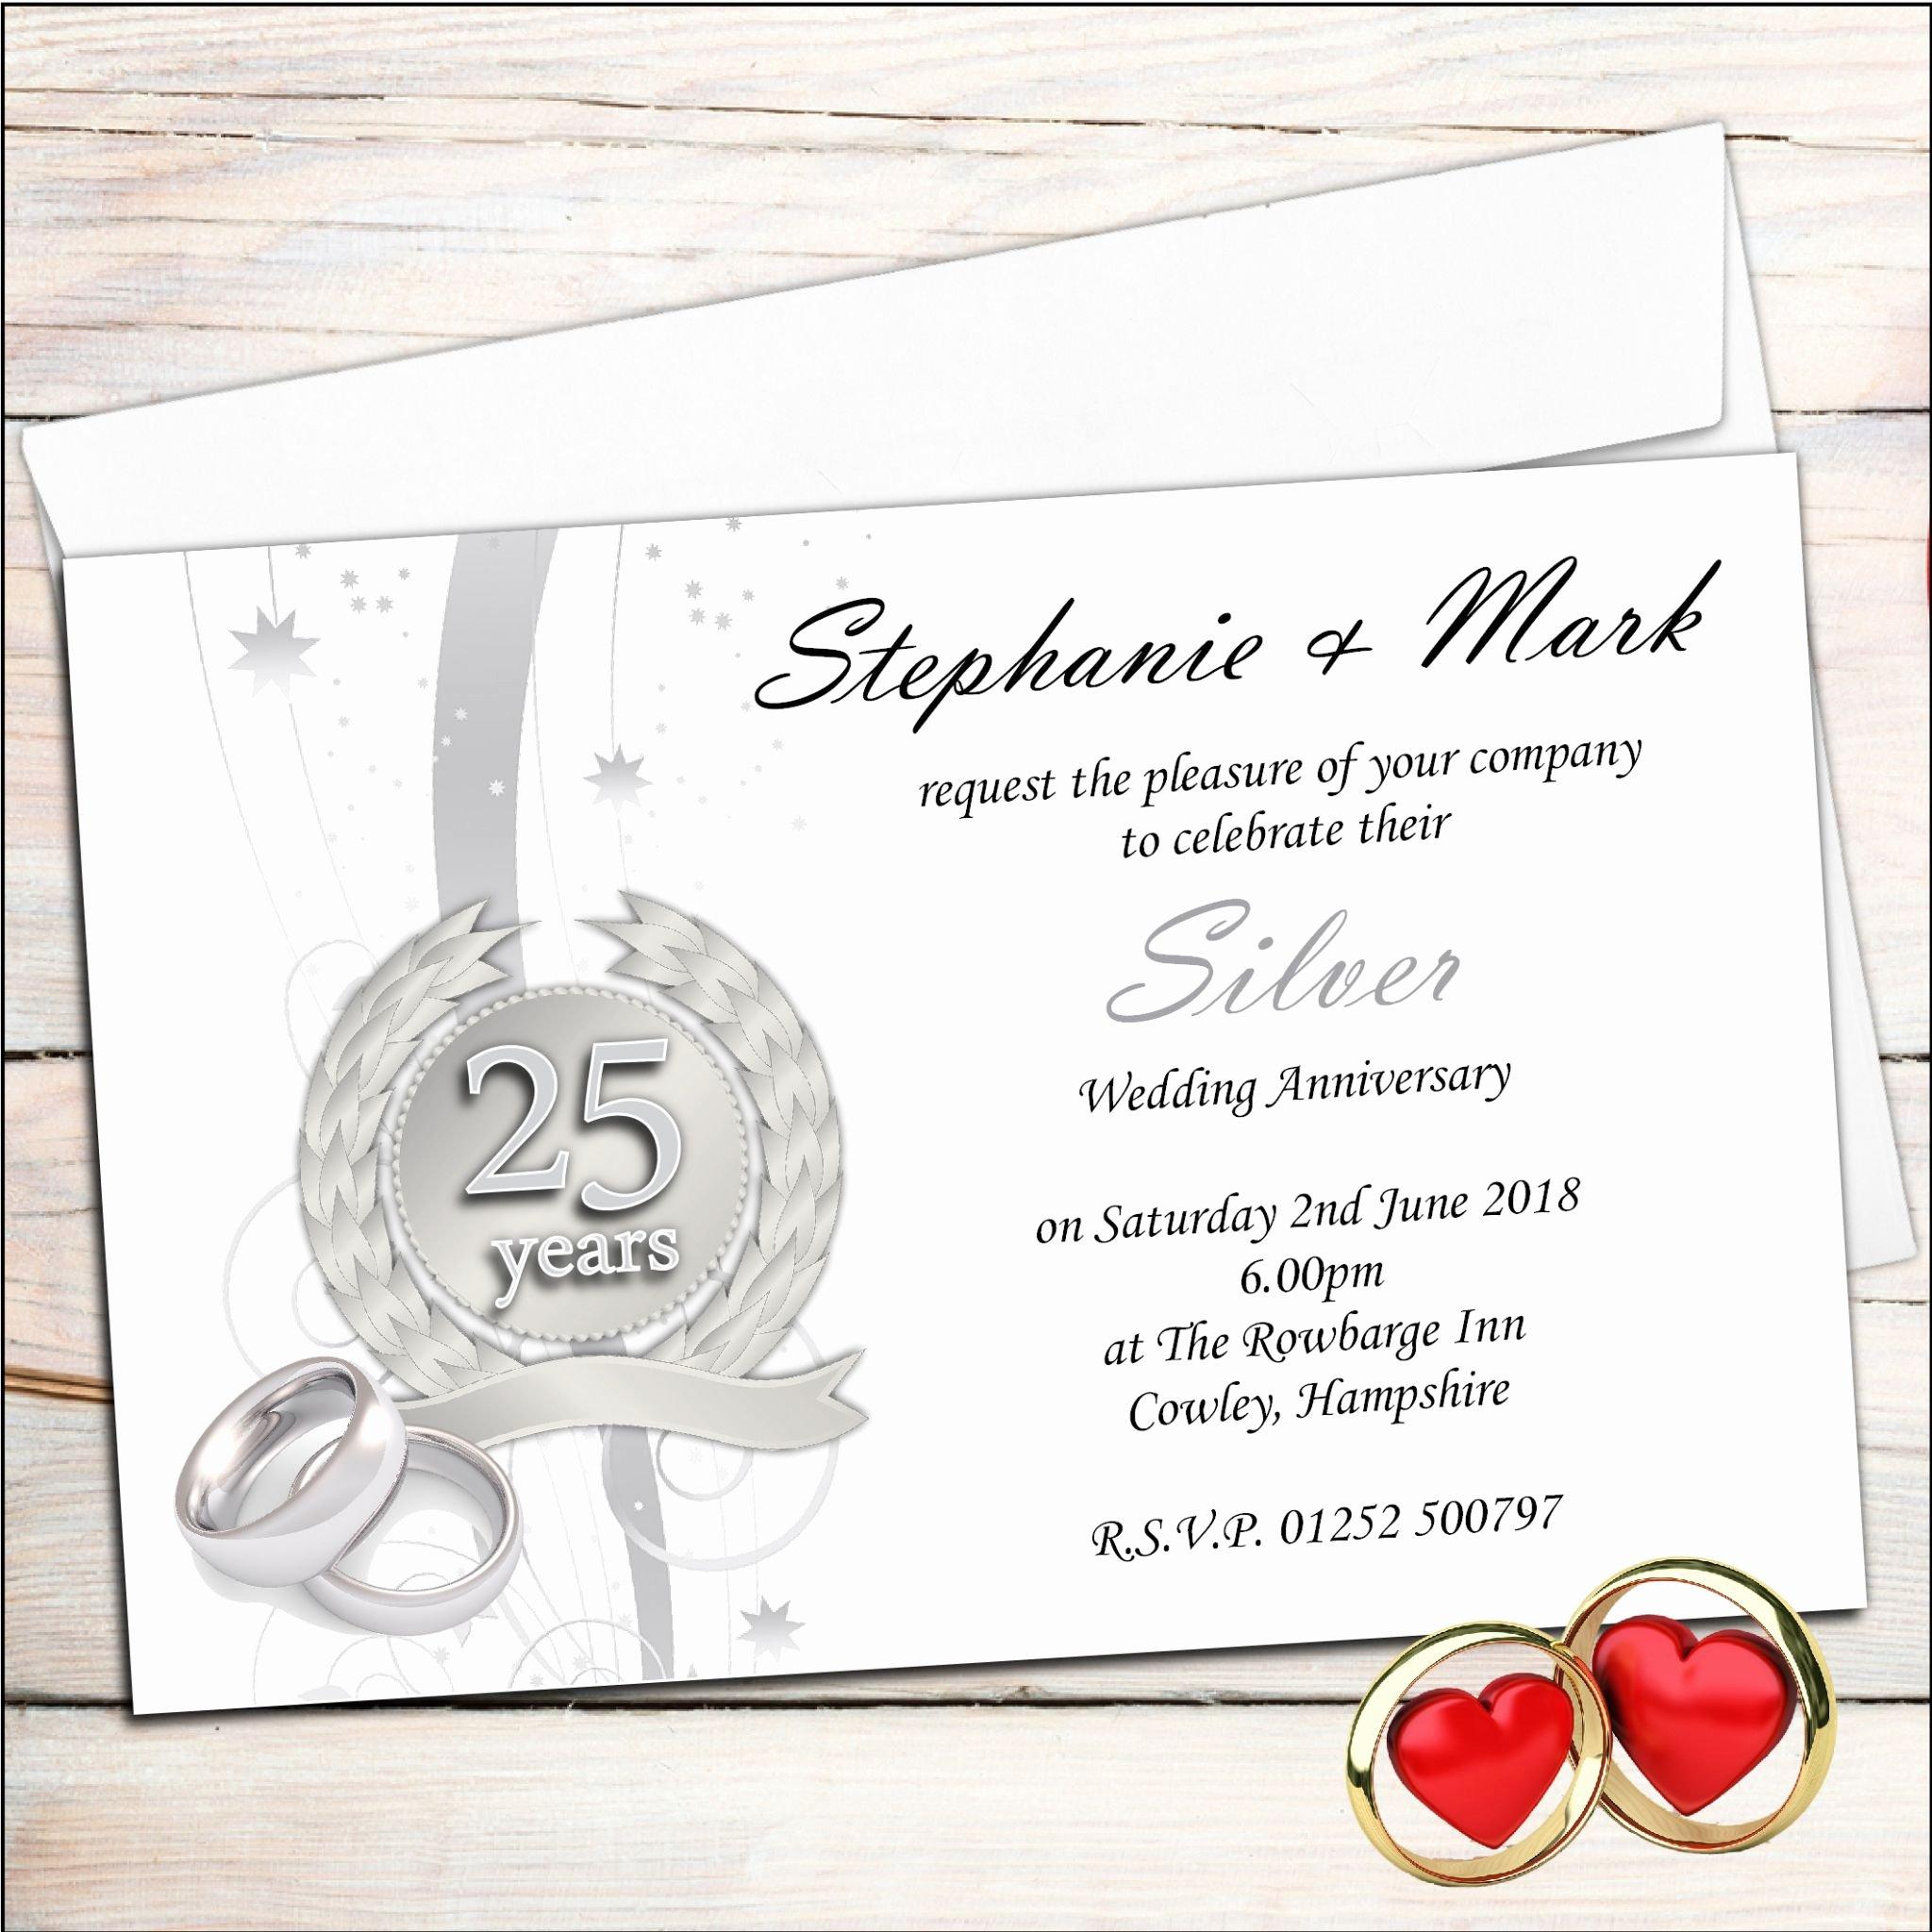 25th Wedding Anniversary Invitations Templates Best Of Anniversary Invitations 25th Silver Wedding Anniversary Invitations Invite Card Ideas